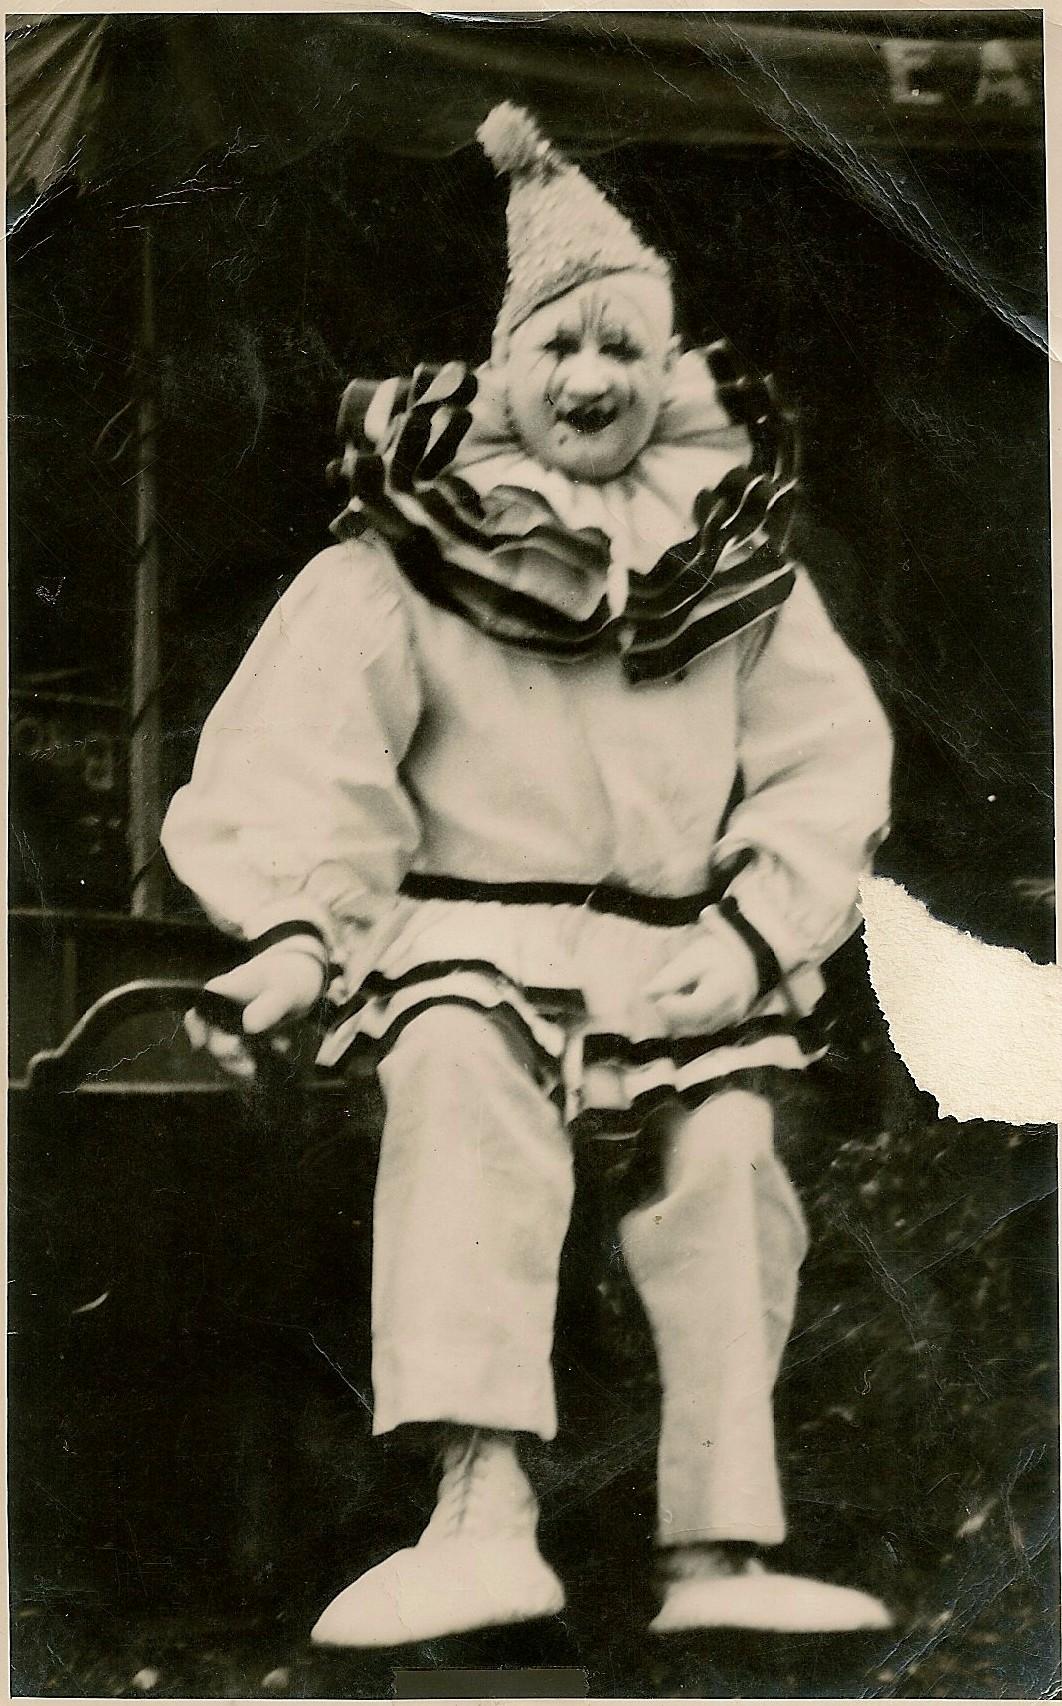 Vintage Clown 69